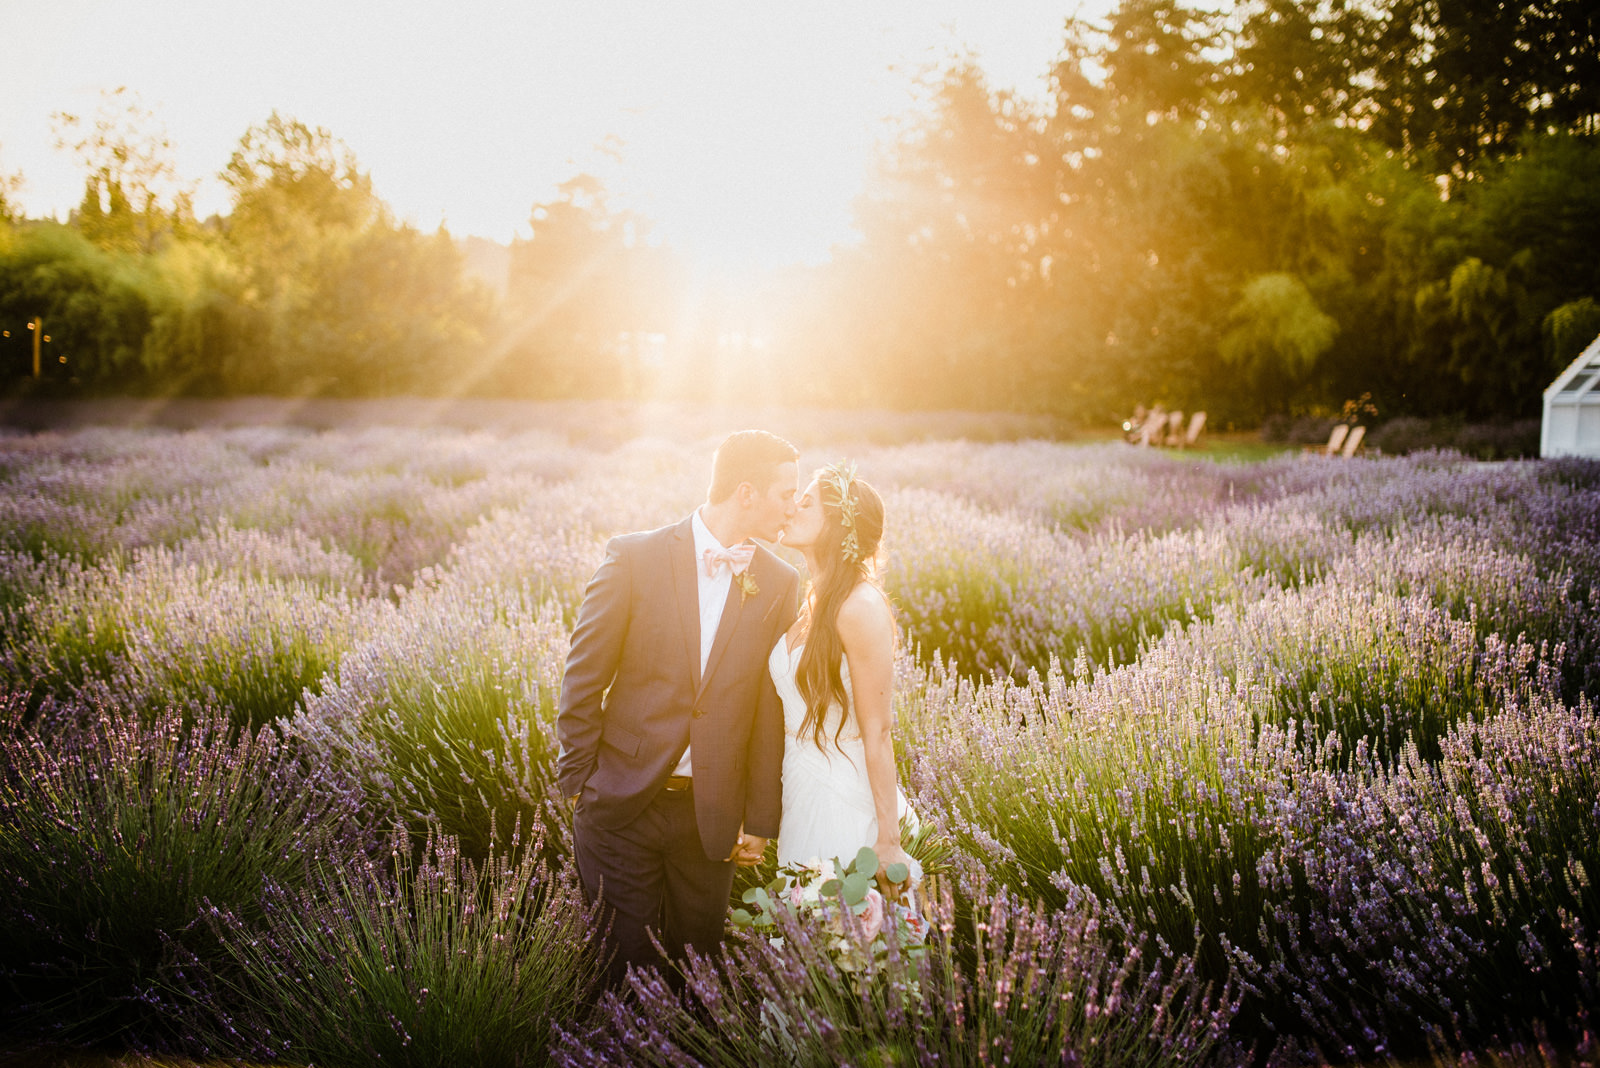 100-woodinville-lavendar-farm-wedding-with-golden-glowy-photos.jpg